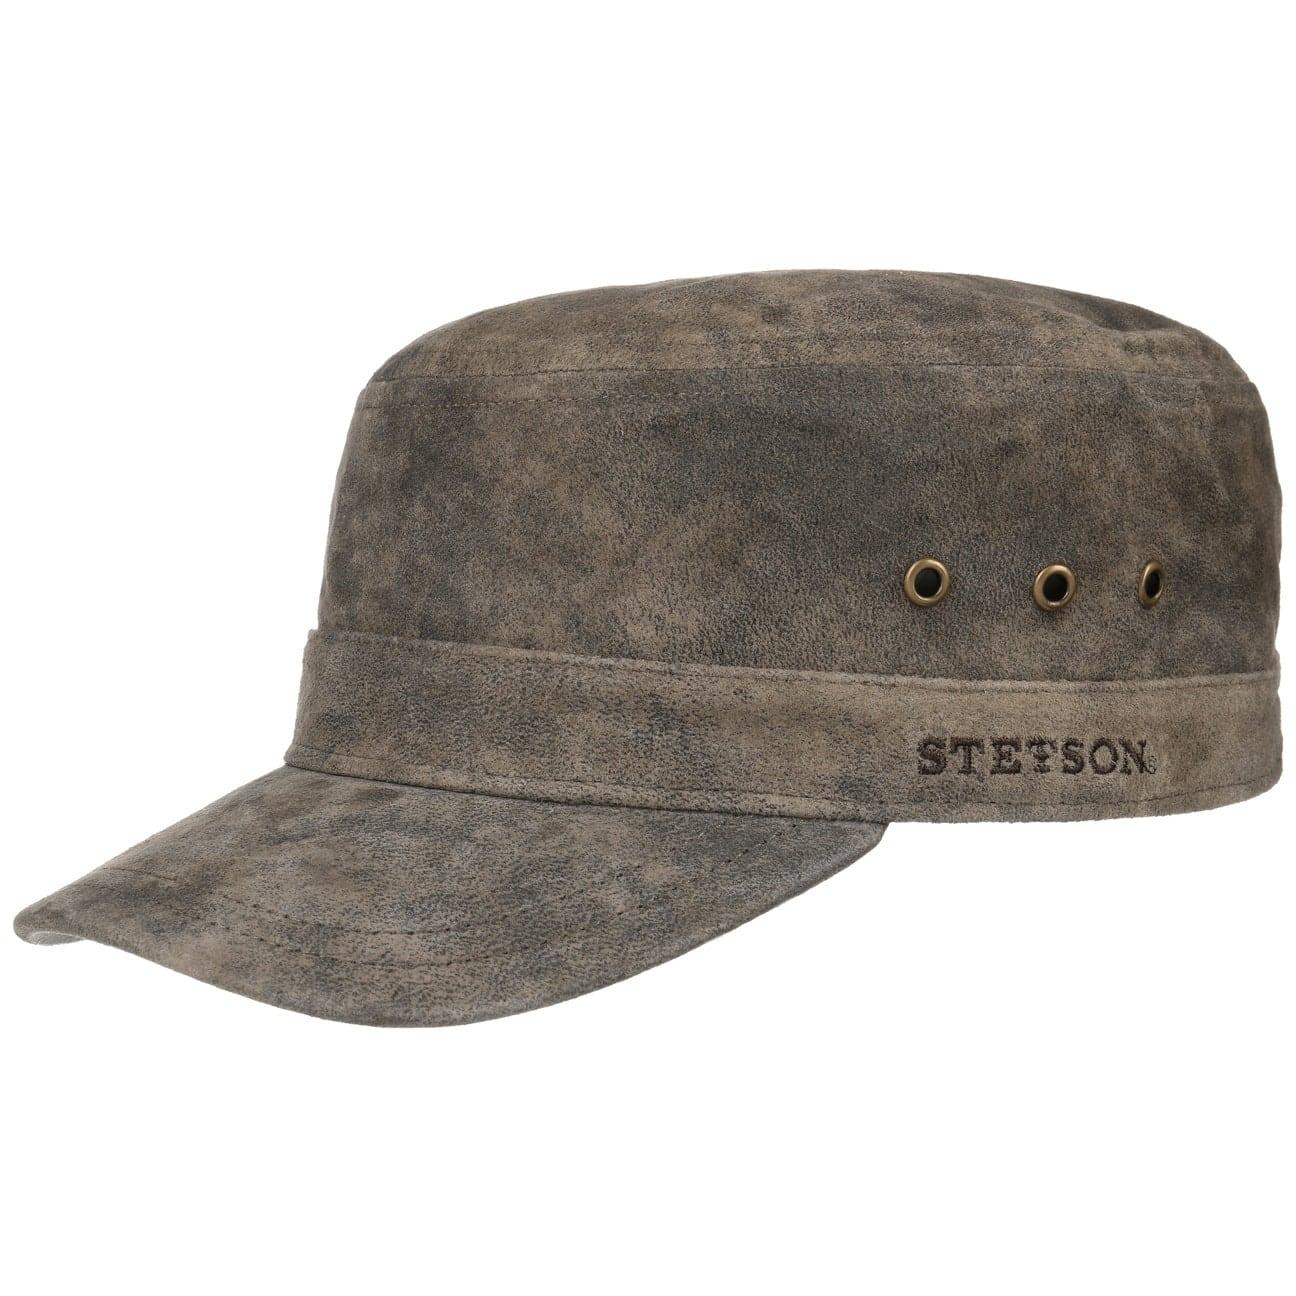 b8cf01a0 ... Raymore Pigskin Army Cap by Stetson - dark brown 5 ...